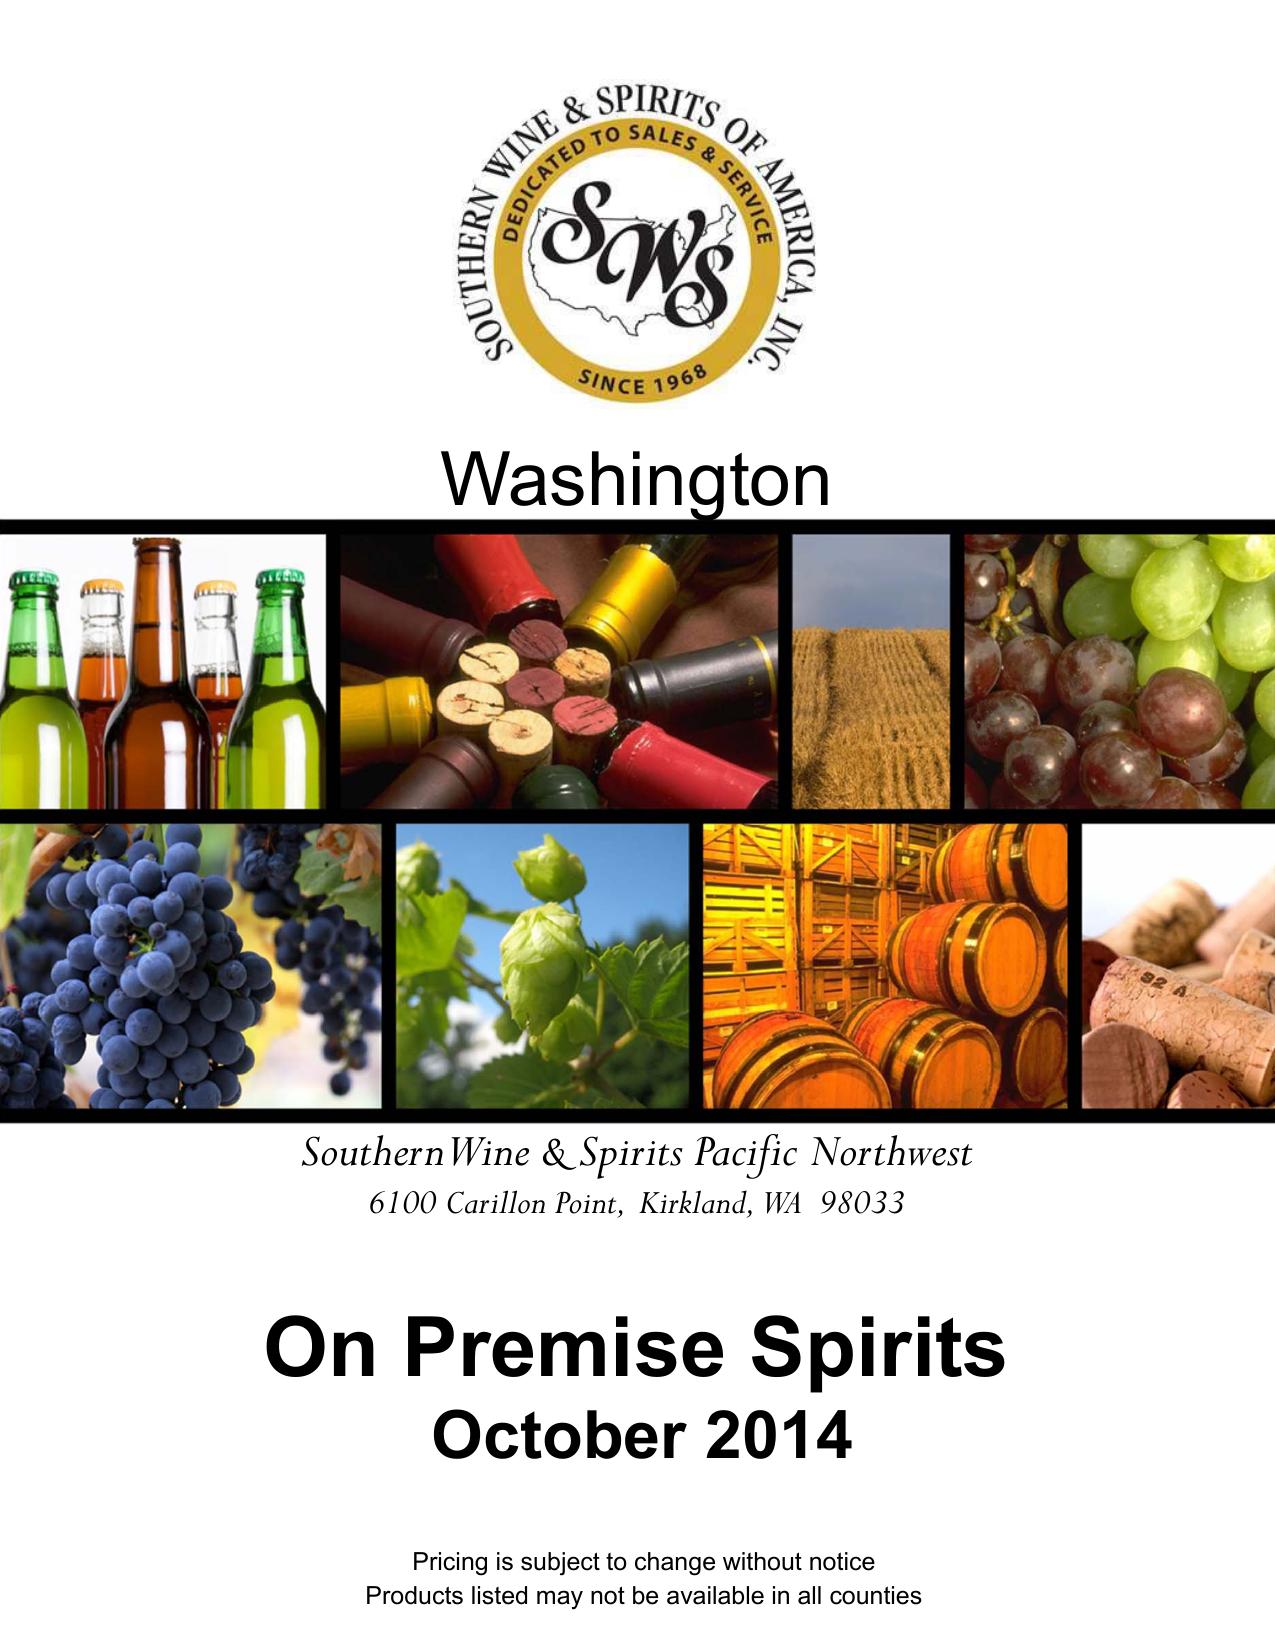 Sws Washington Spirits On Premise October 2014 Price Guide